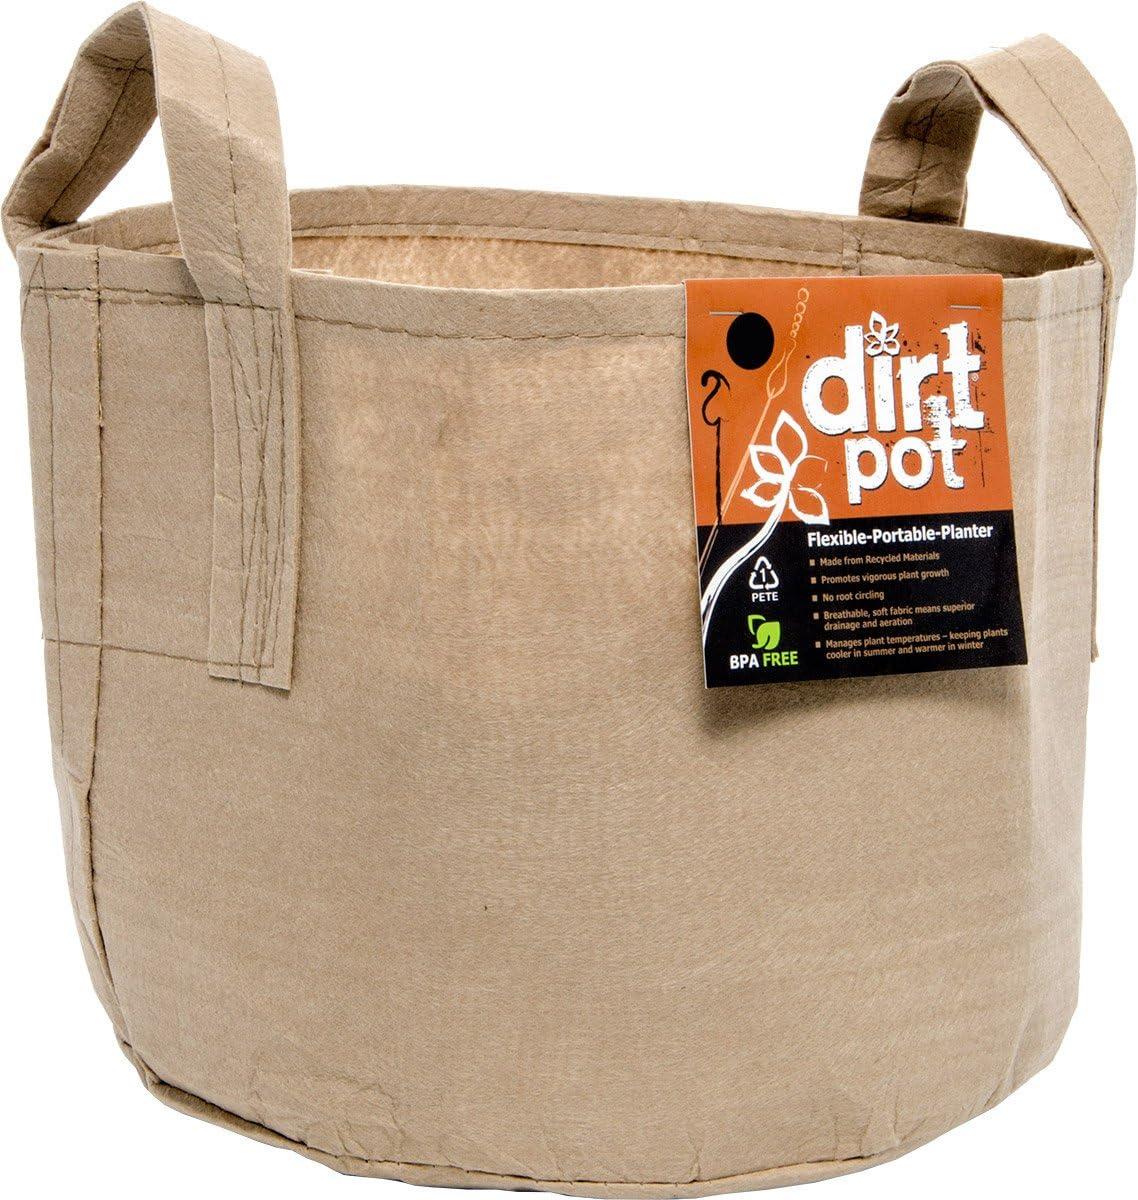 Hydrofarm HGDBT20H Dirt Pot with Handle, 20 Gallon, Tan Flexible Portable Fabric Planter, 20 gal